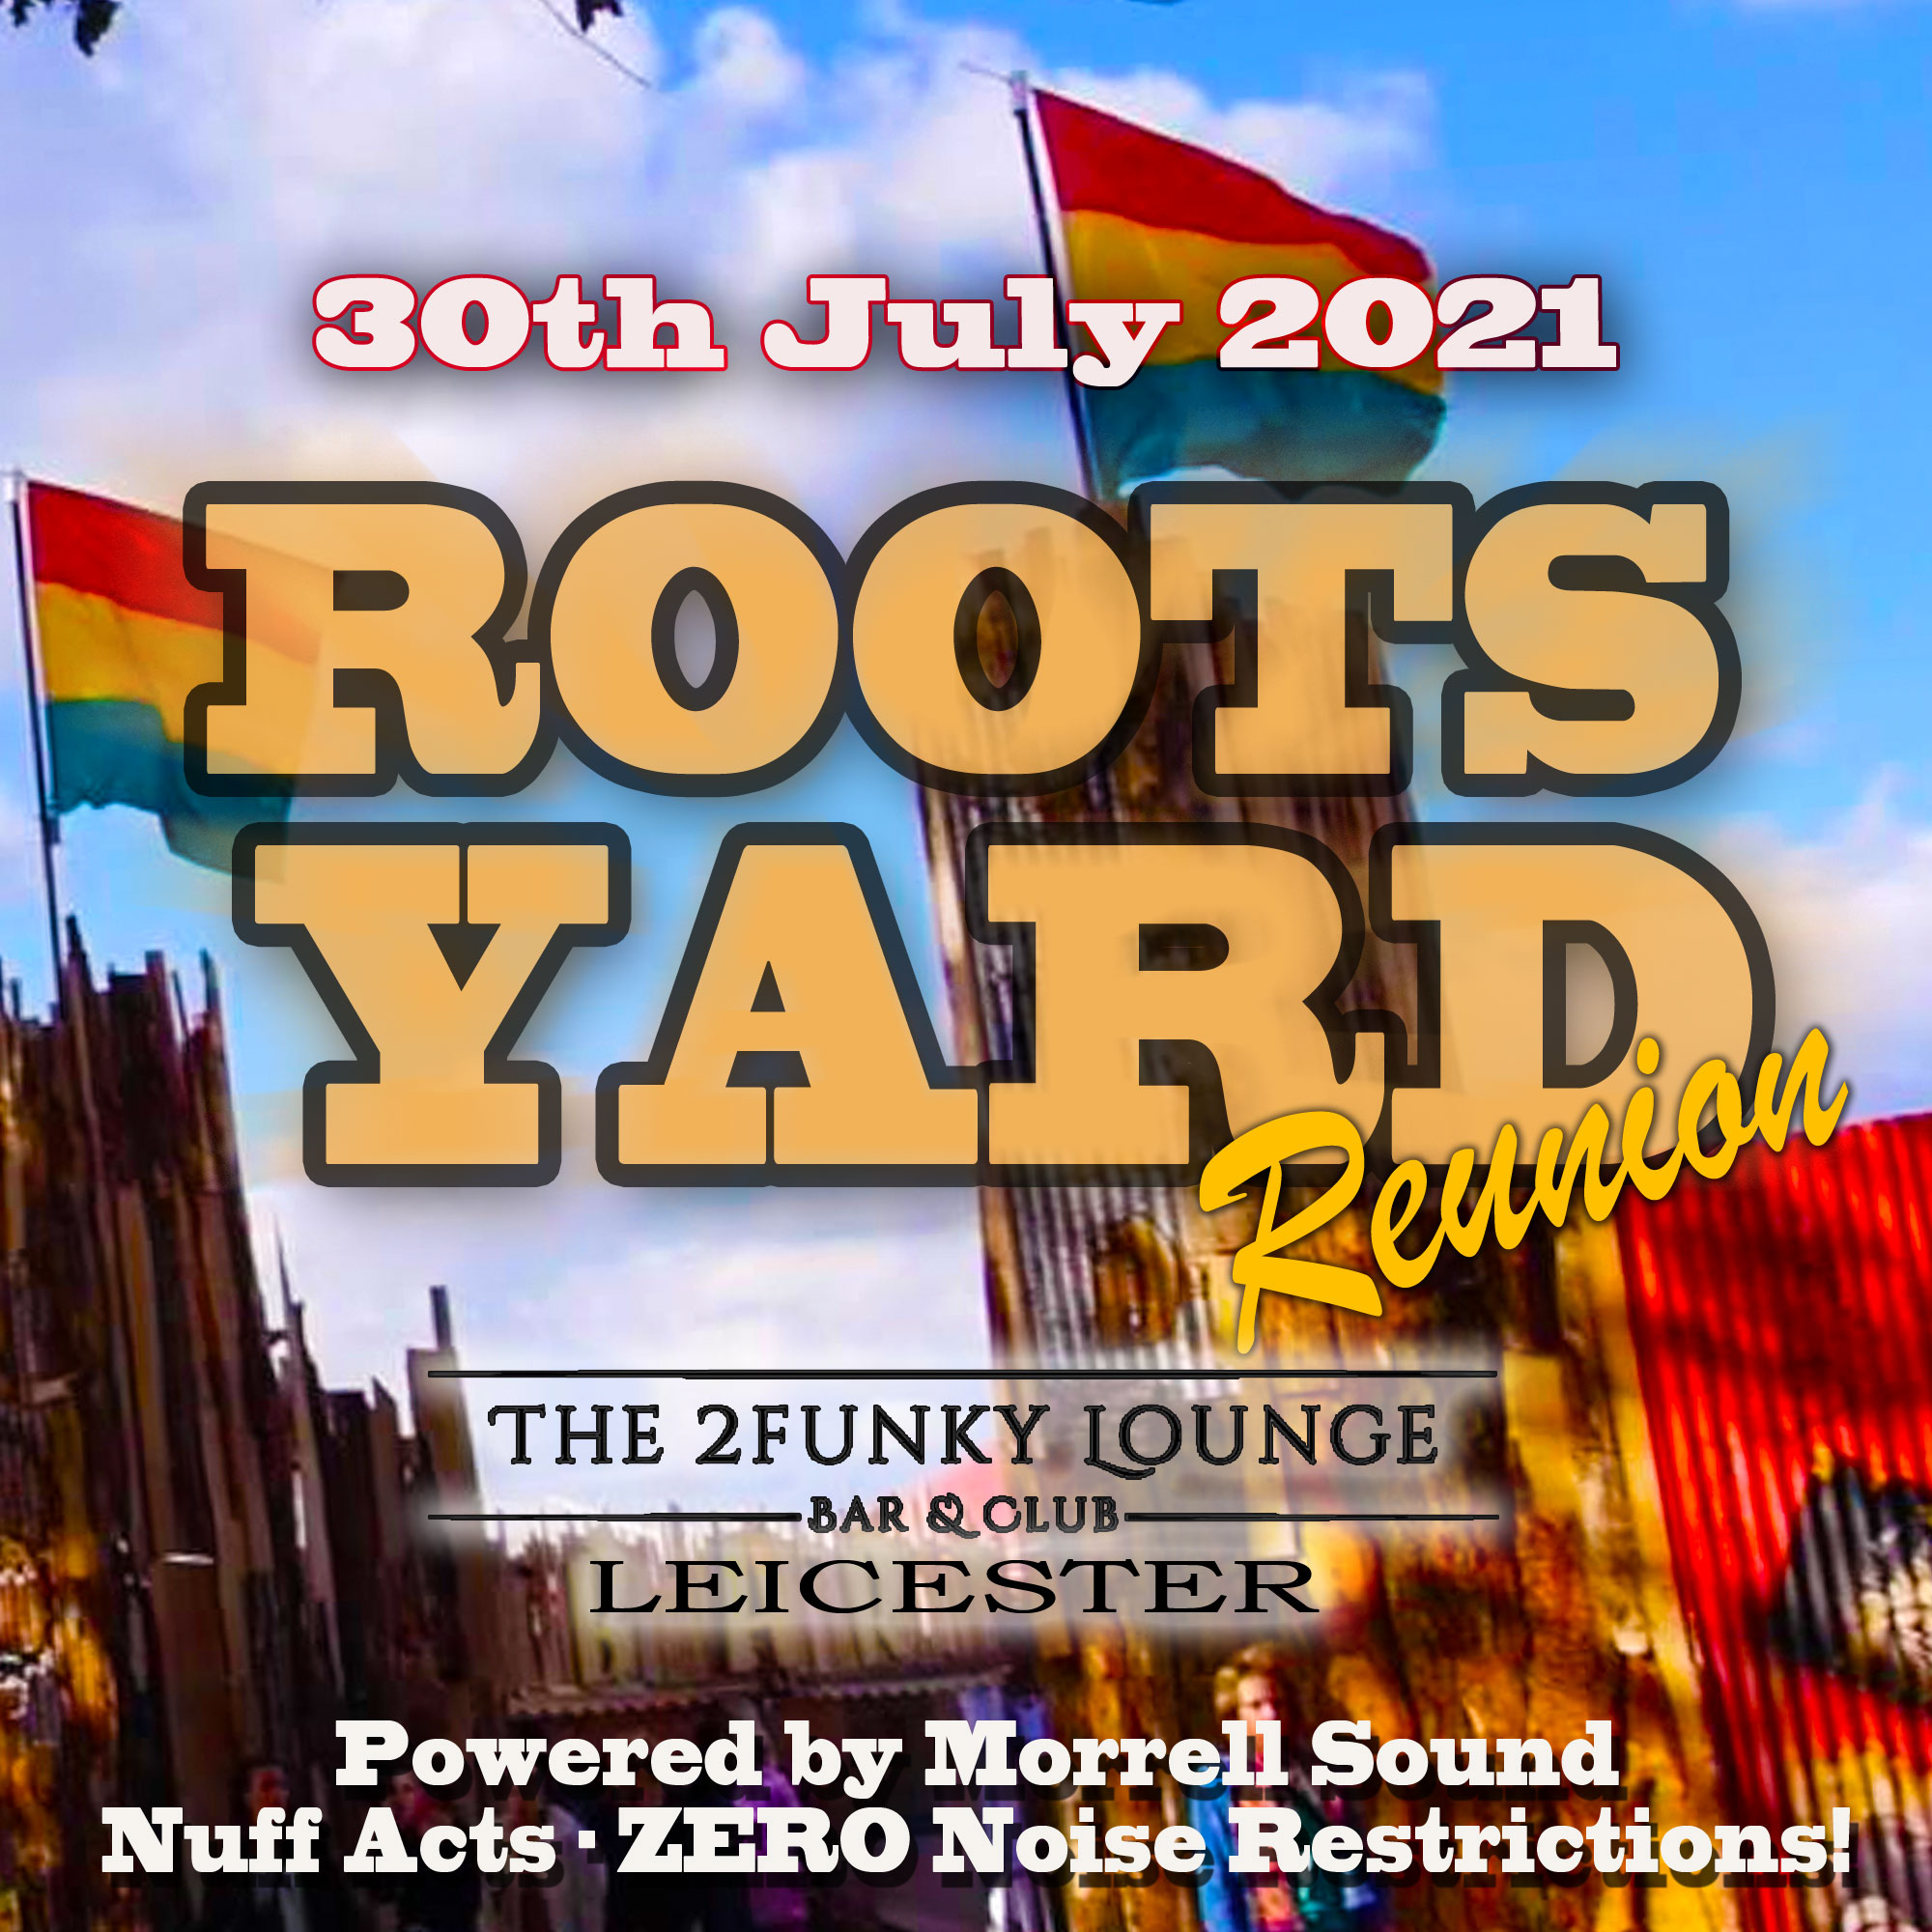 roots-yard-reunion-insta-post